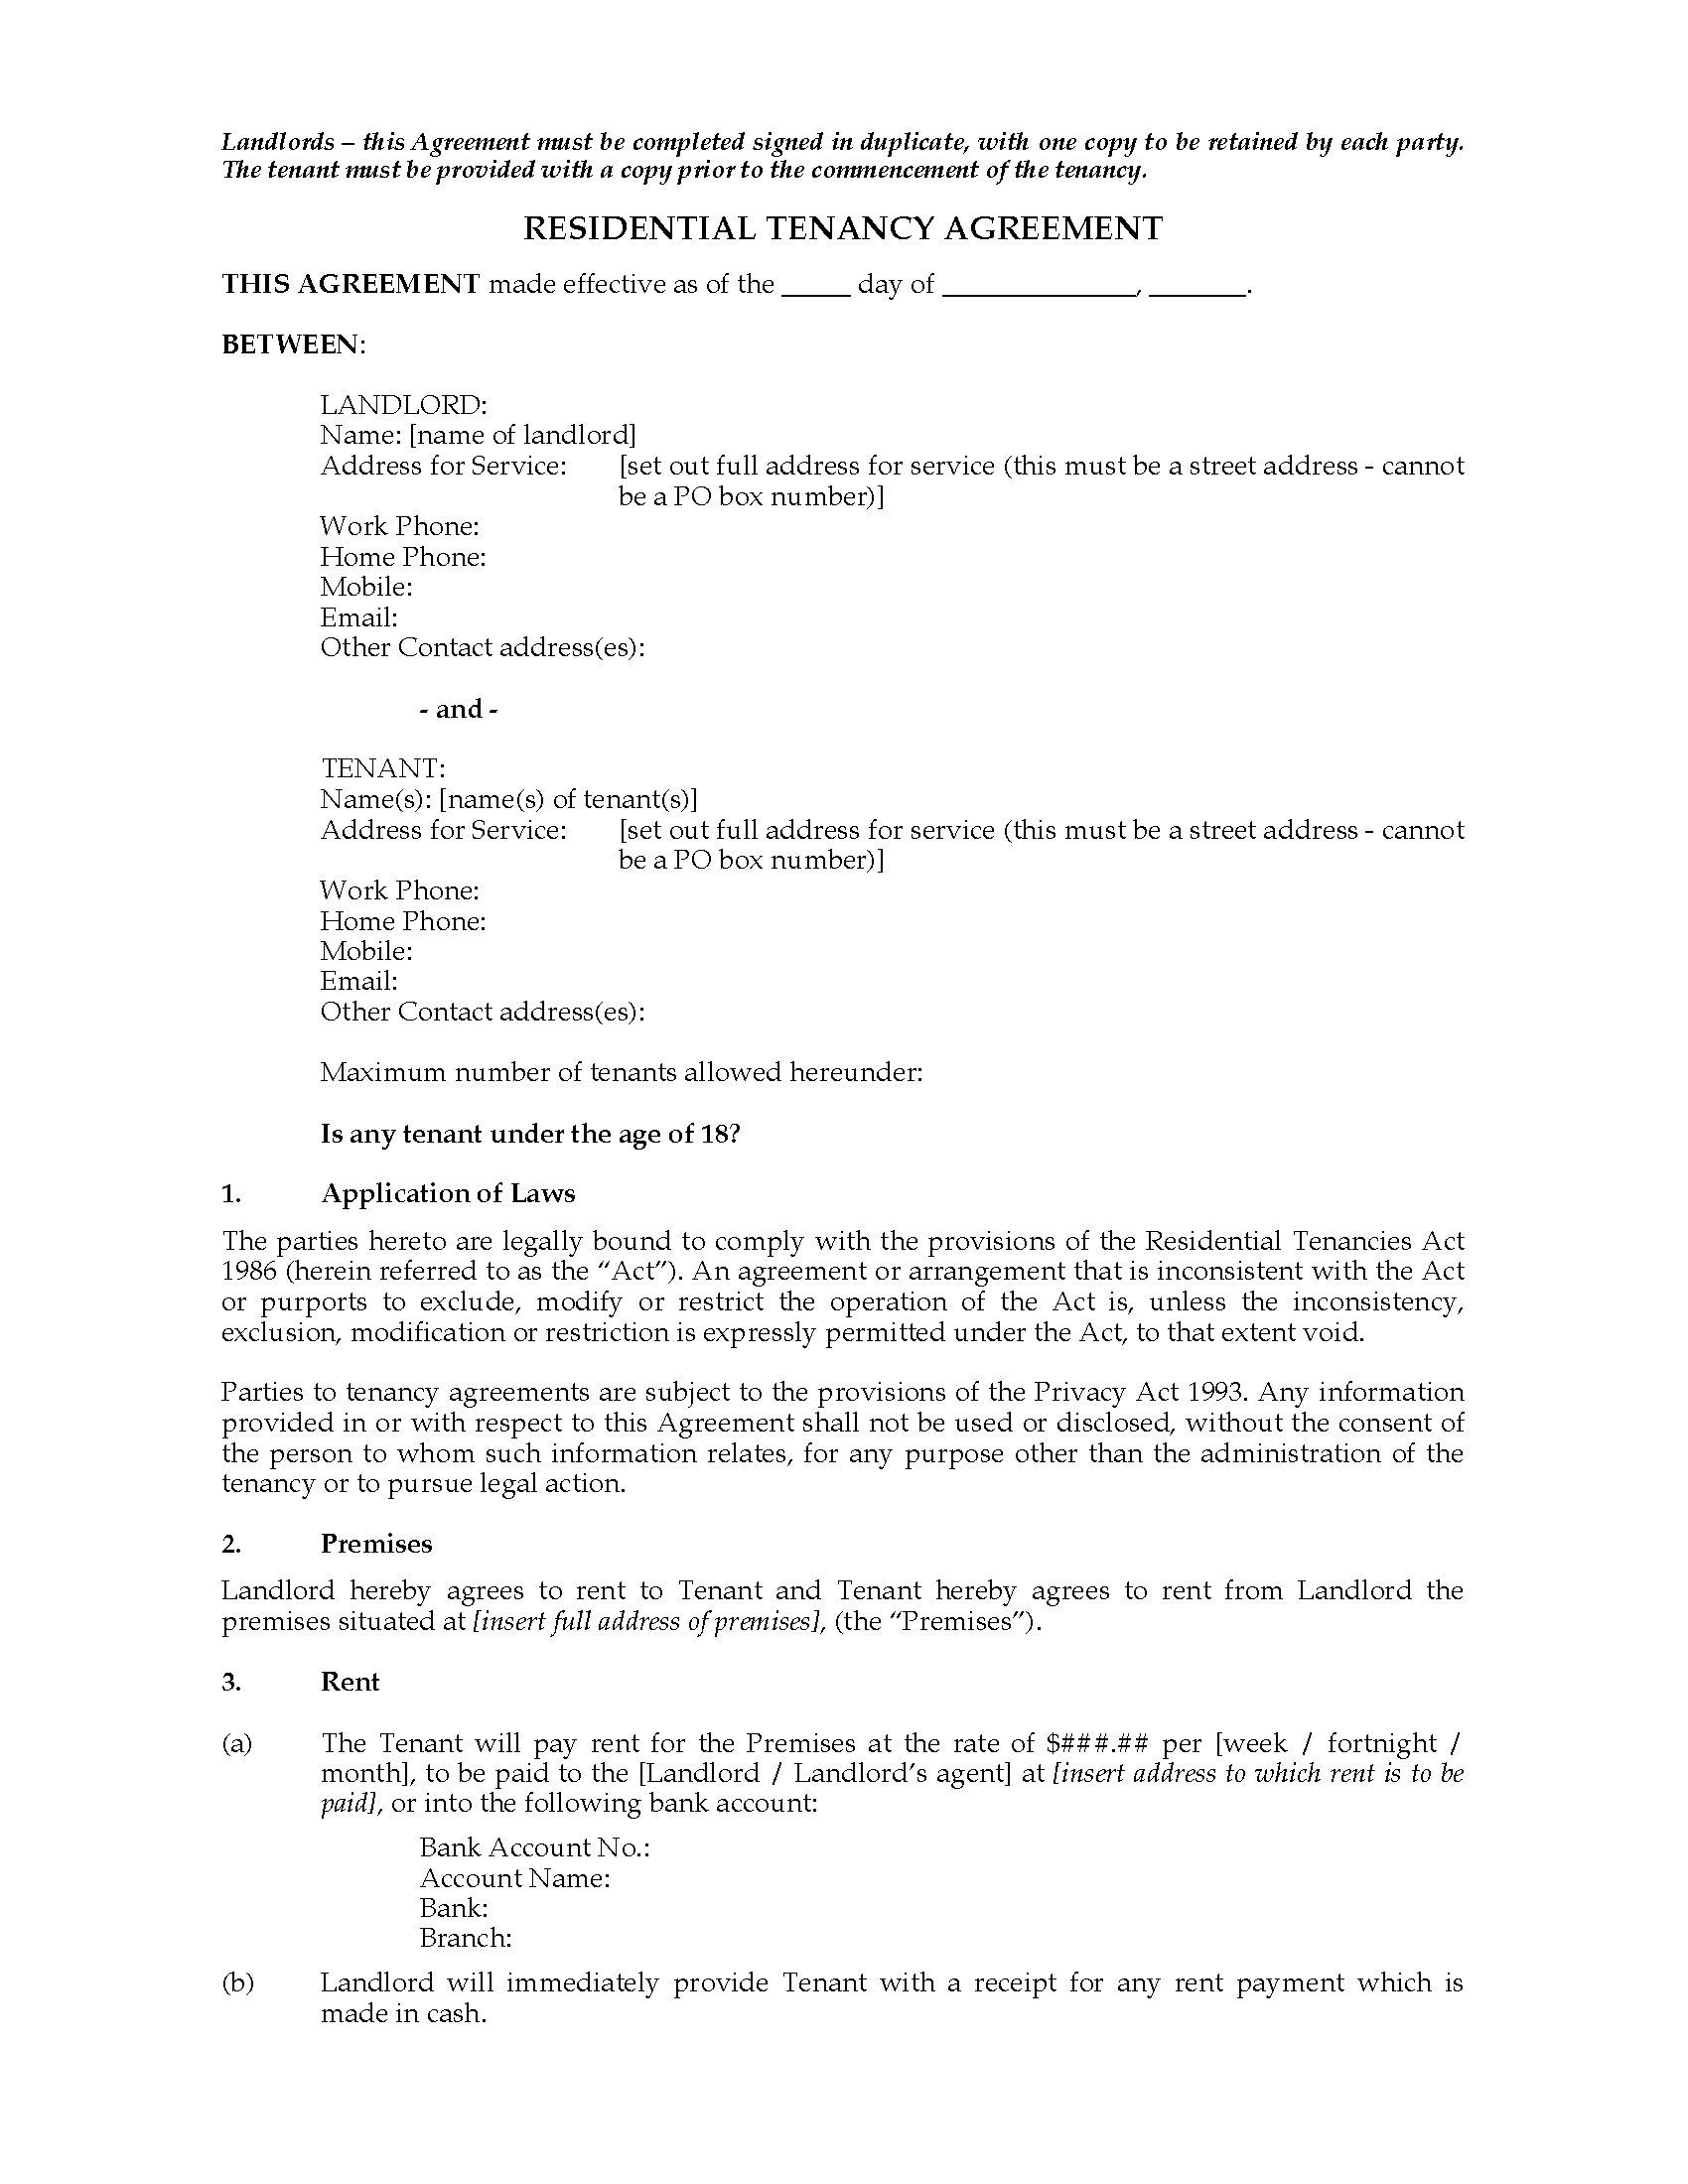 Residential Tenancy Application Form Nz